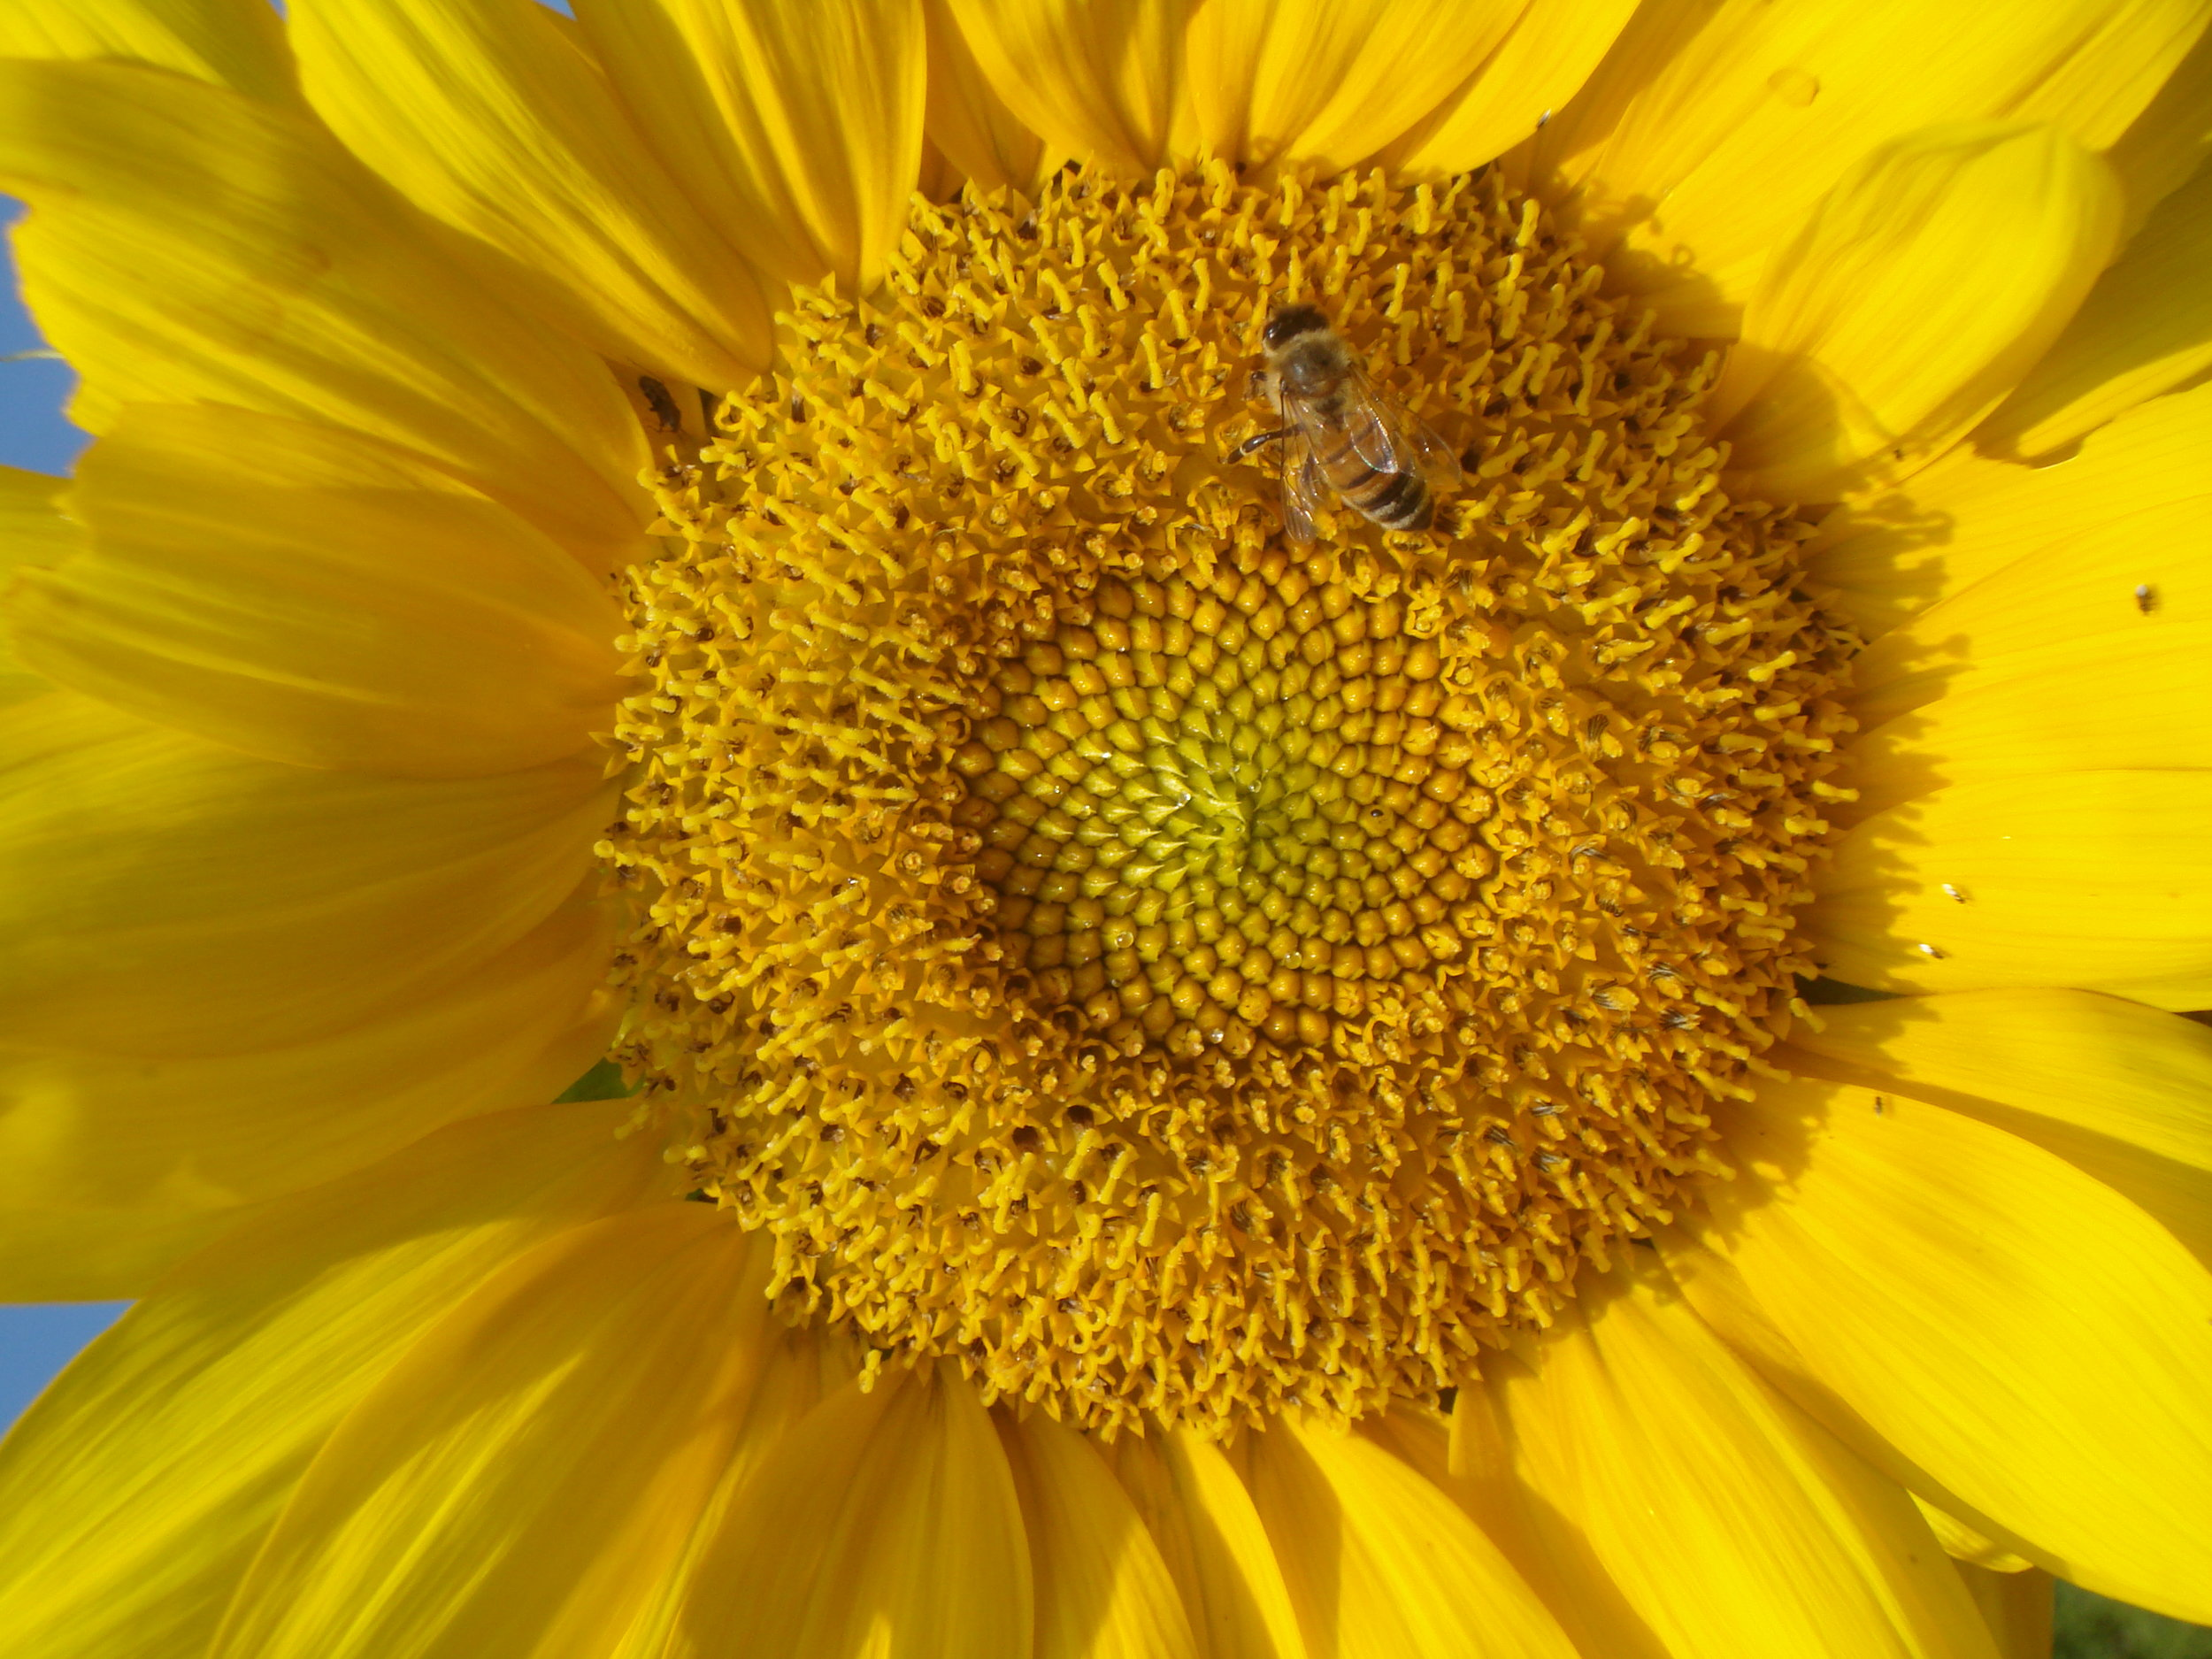 Honey bee on a sunflower.JPG